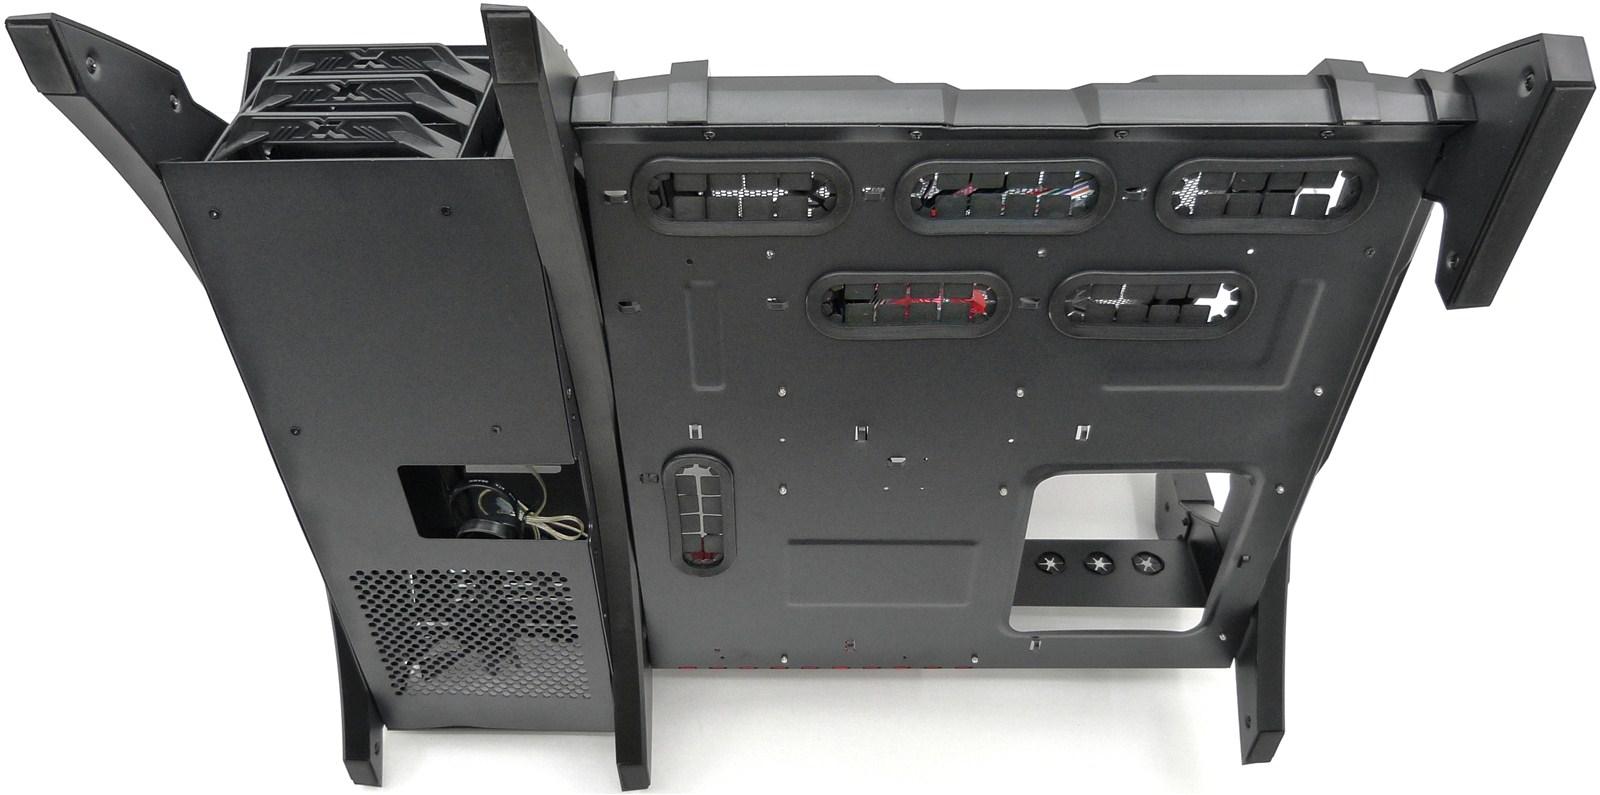 Review Caja de Diseño Abierto AEROCOOL STRIKE X AIR. Premio Diseño  #674548 1600x795